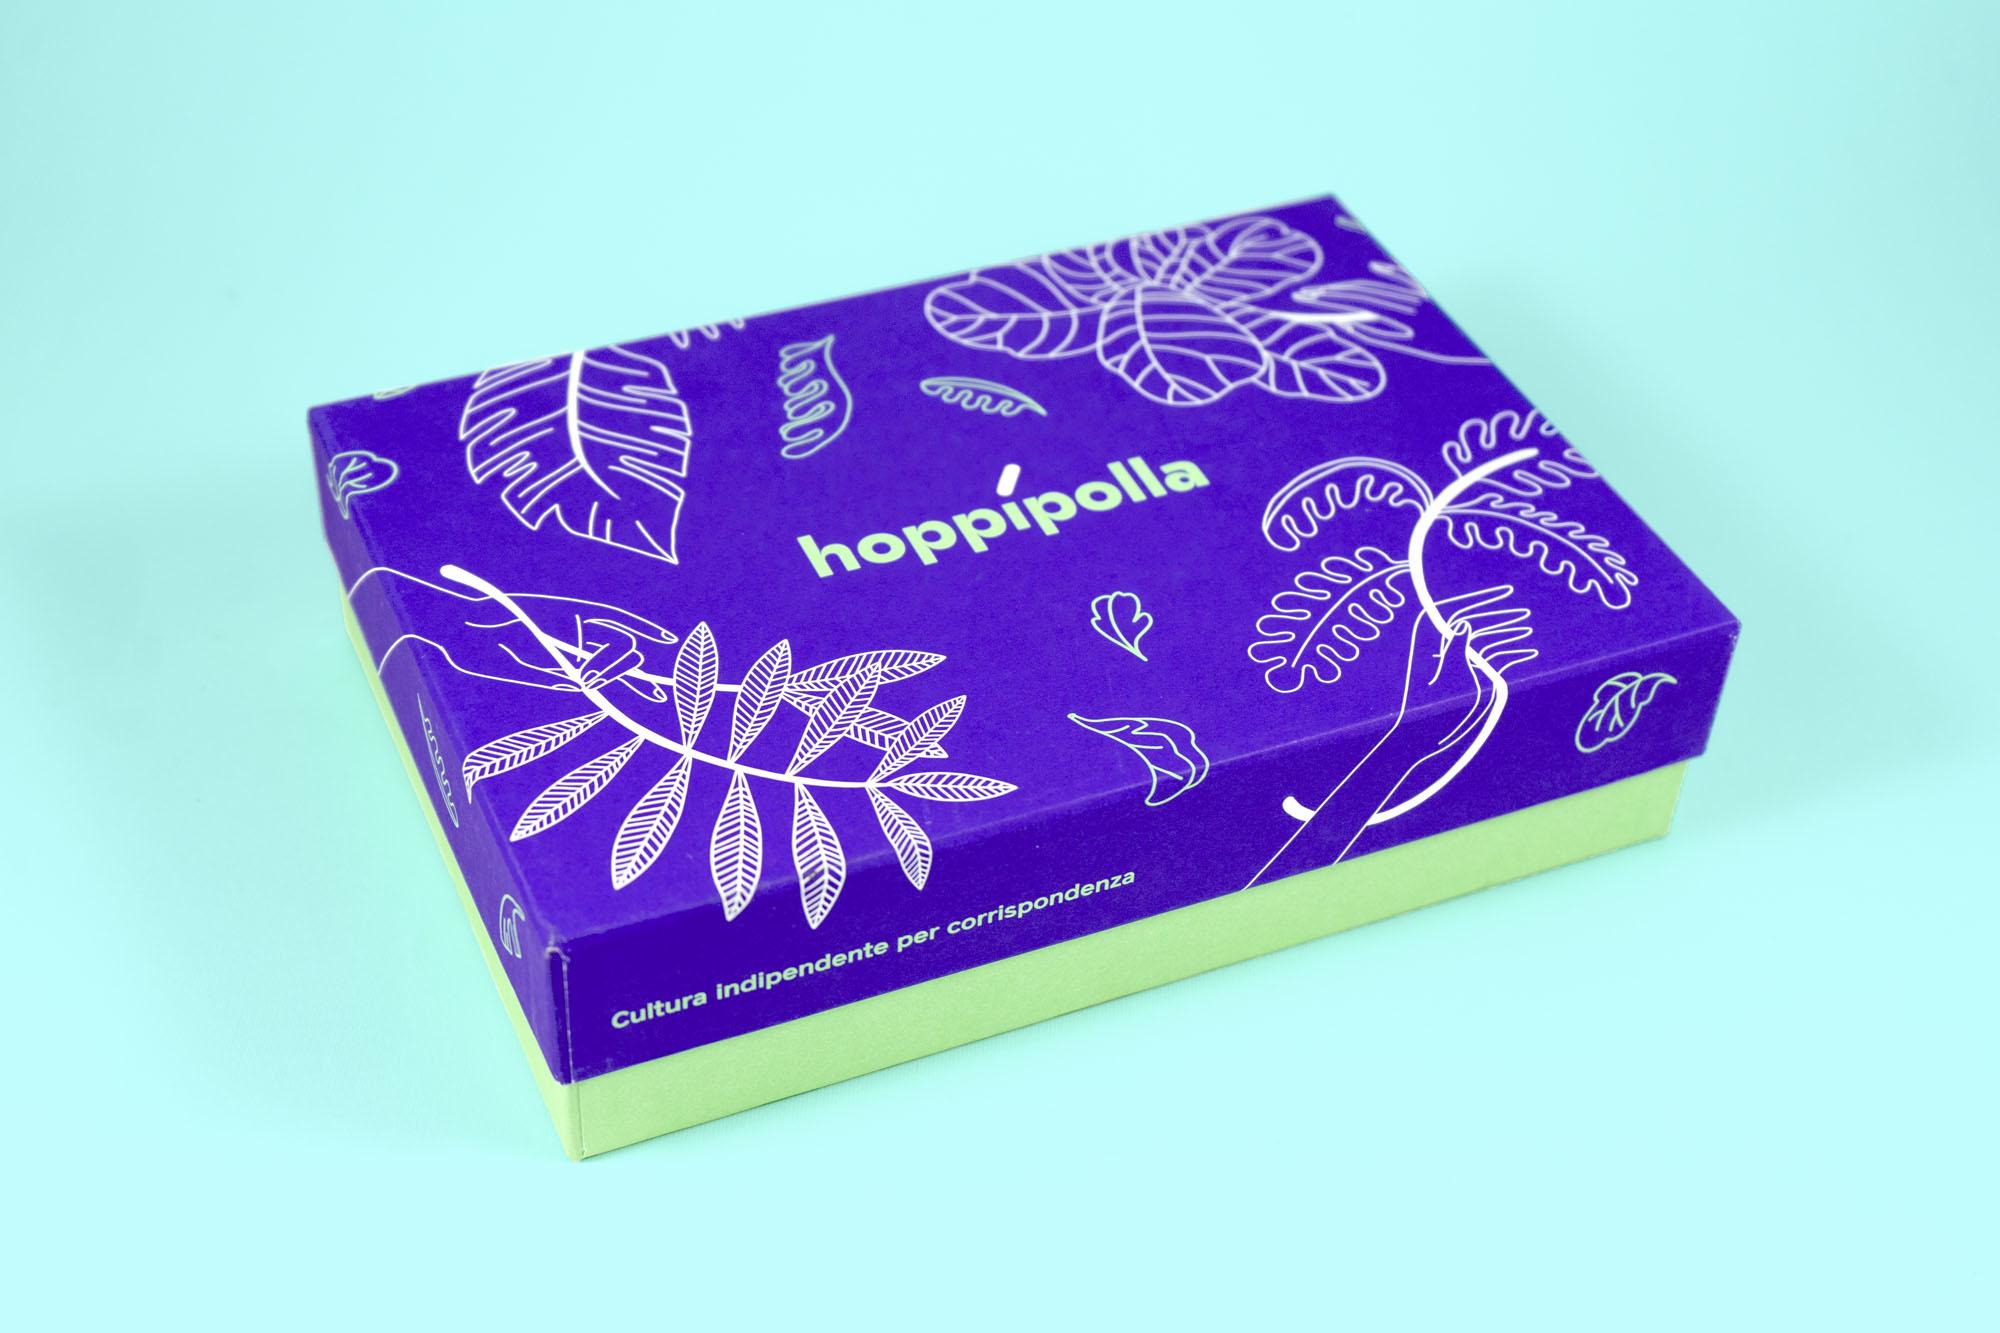 hoppipolla-19-box colomboni (4)